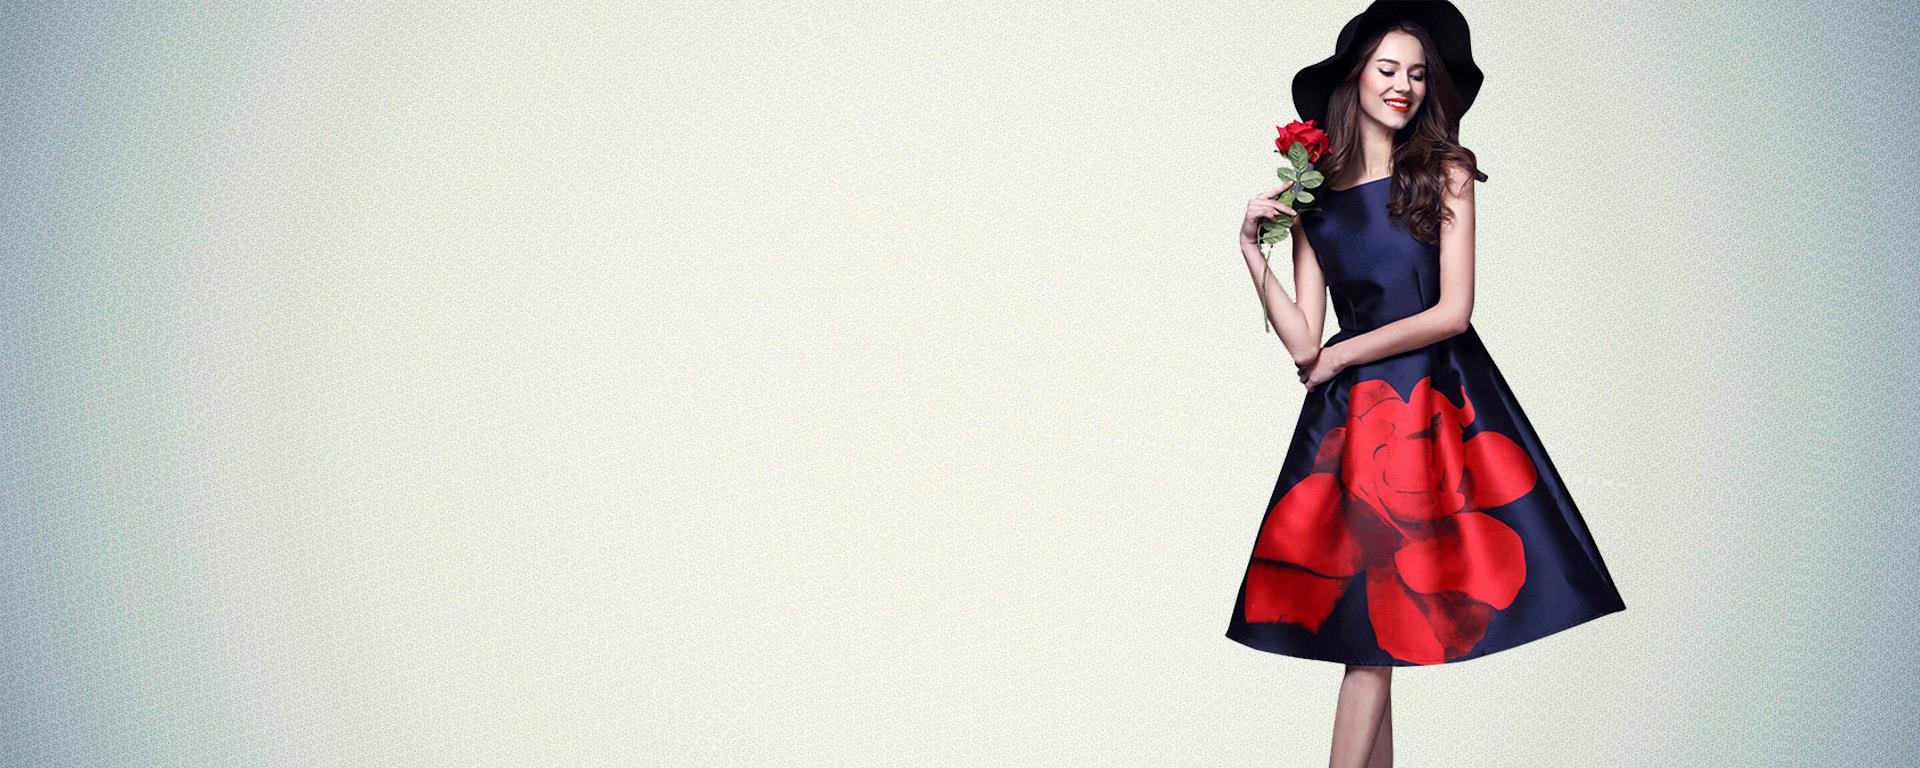 free shipping on every product zyla fashion